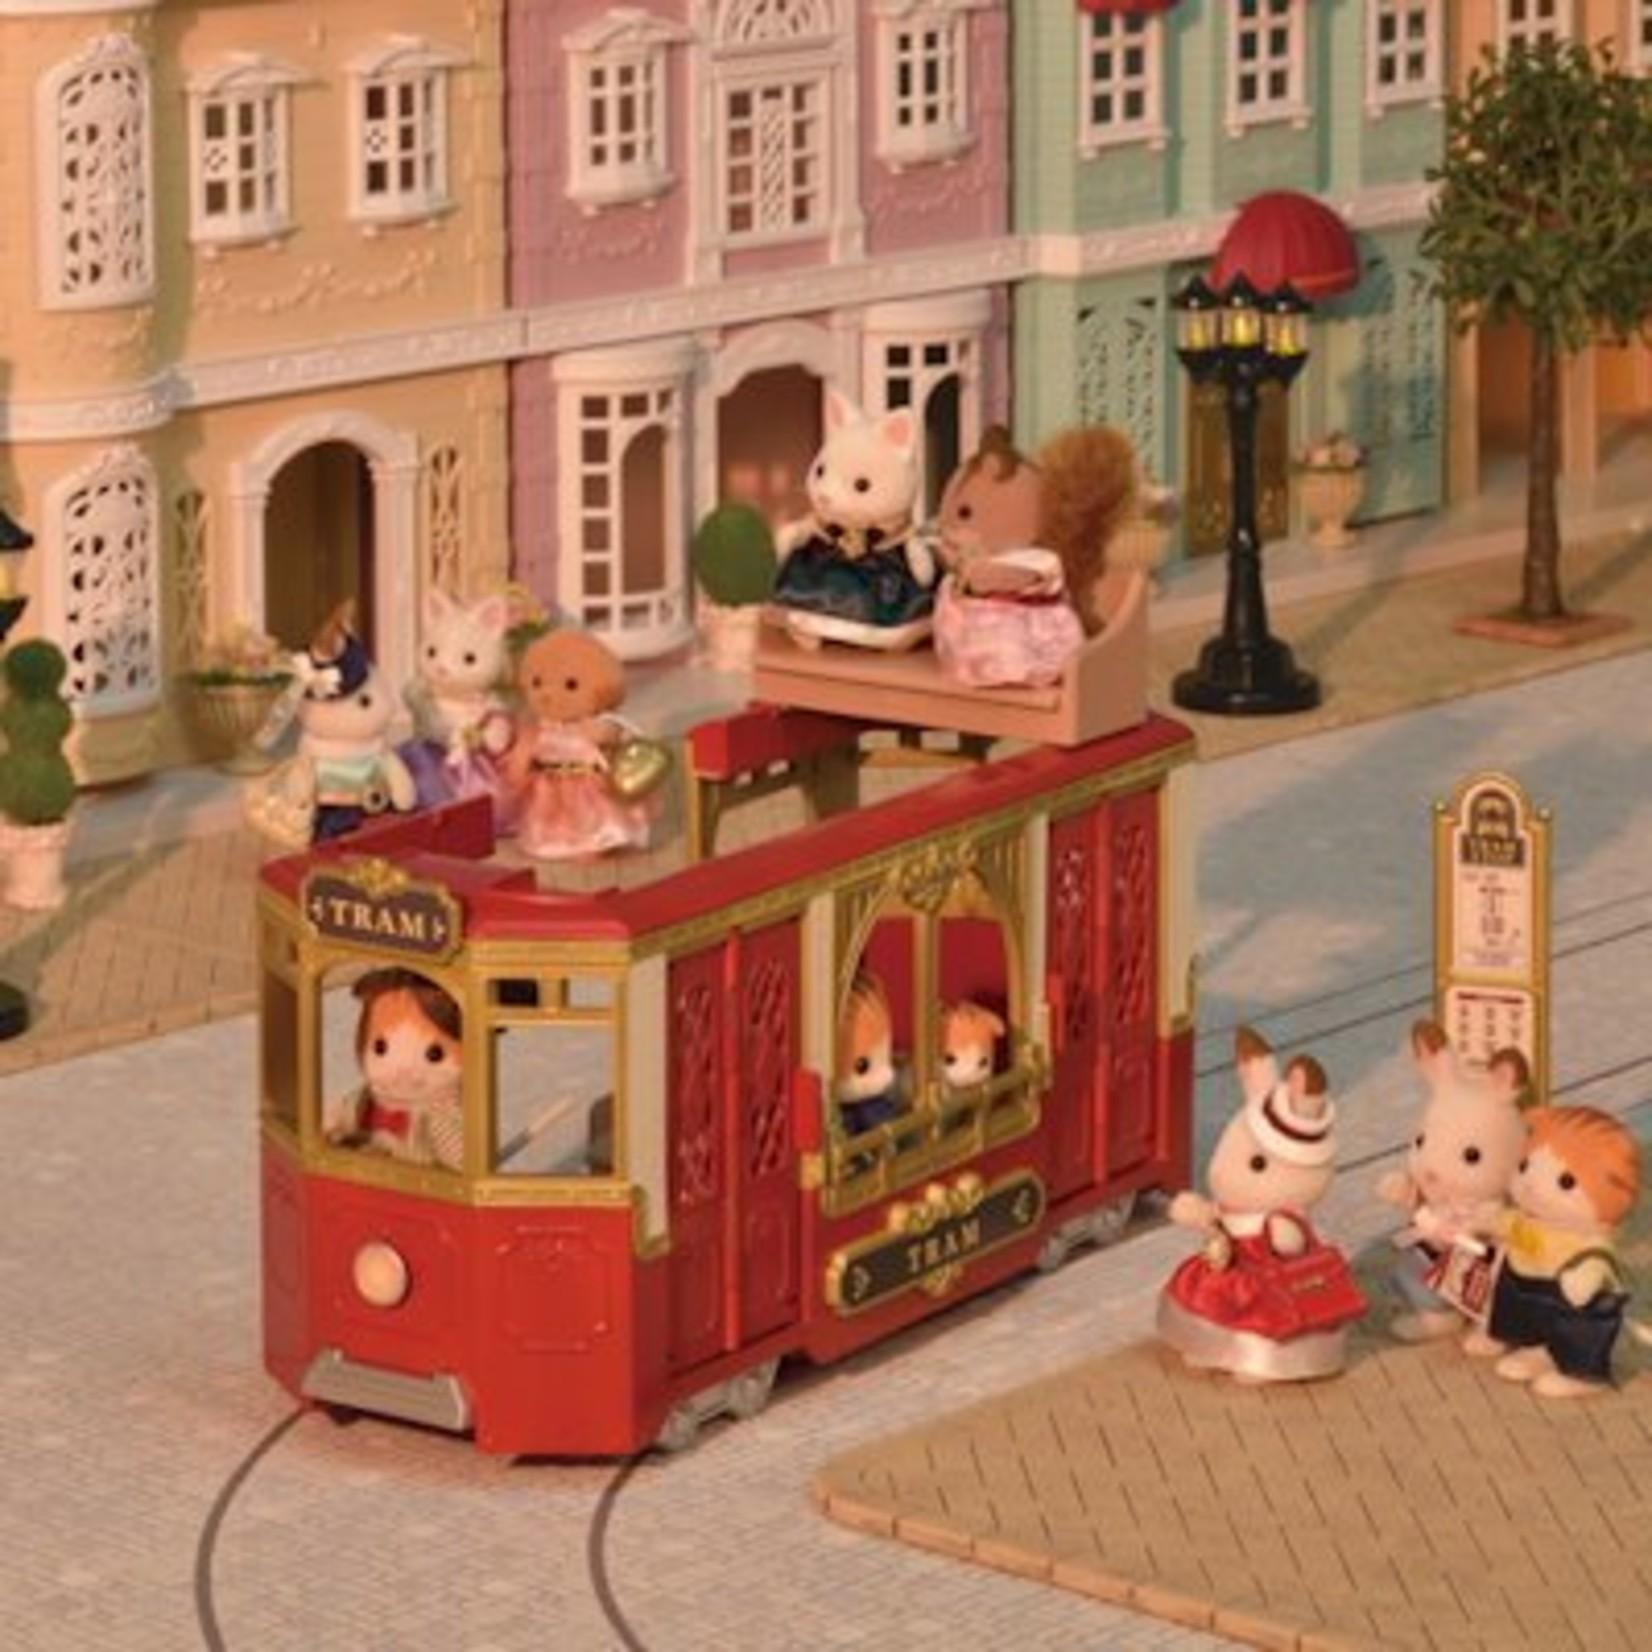 Sylvanian Families Tram